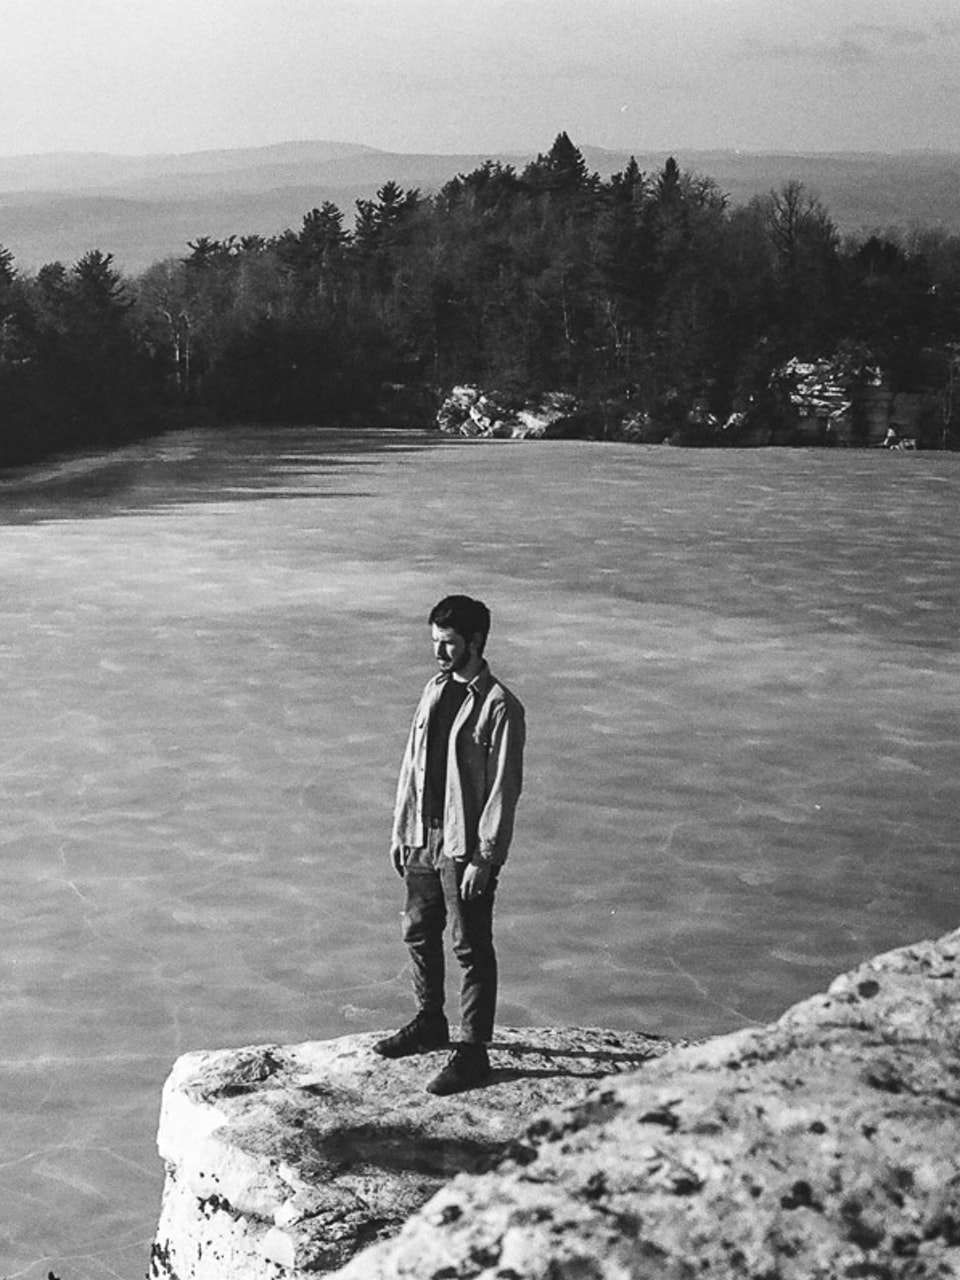 Black and White Film - Lake Minnewaska, Rochester, NY